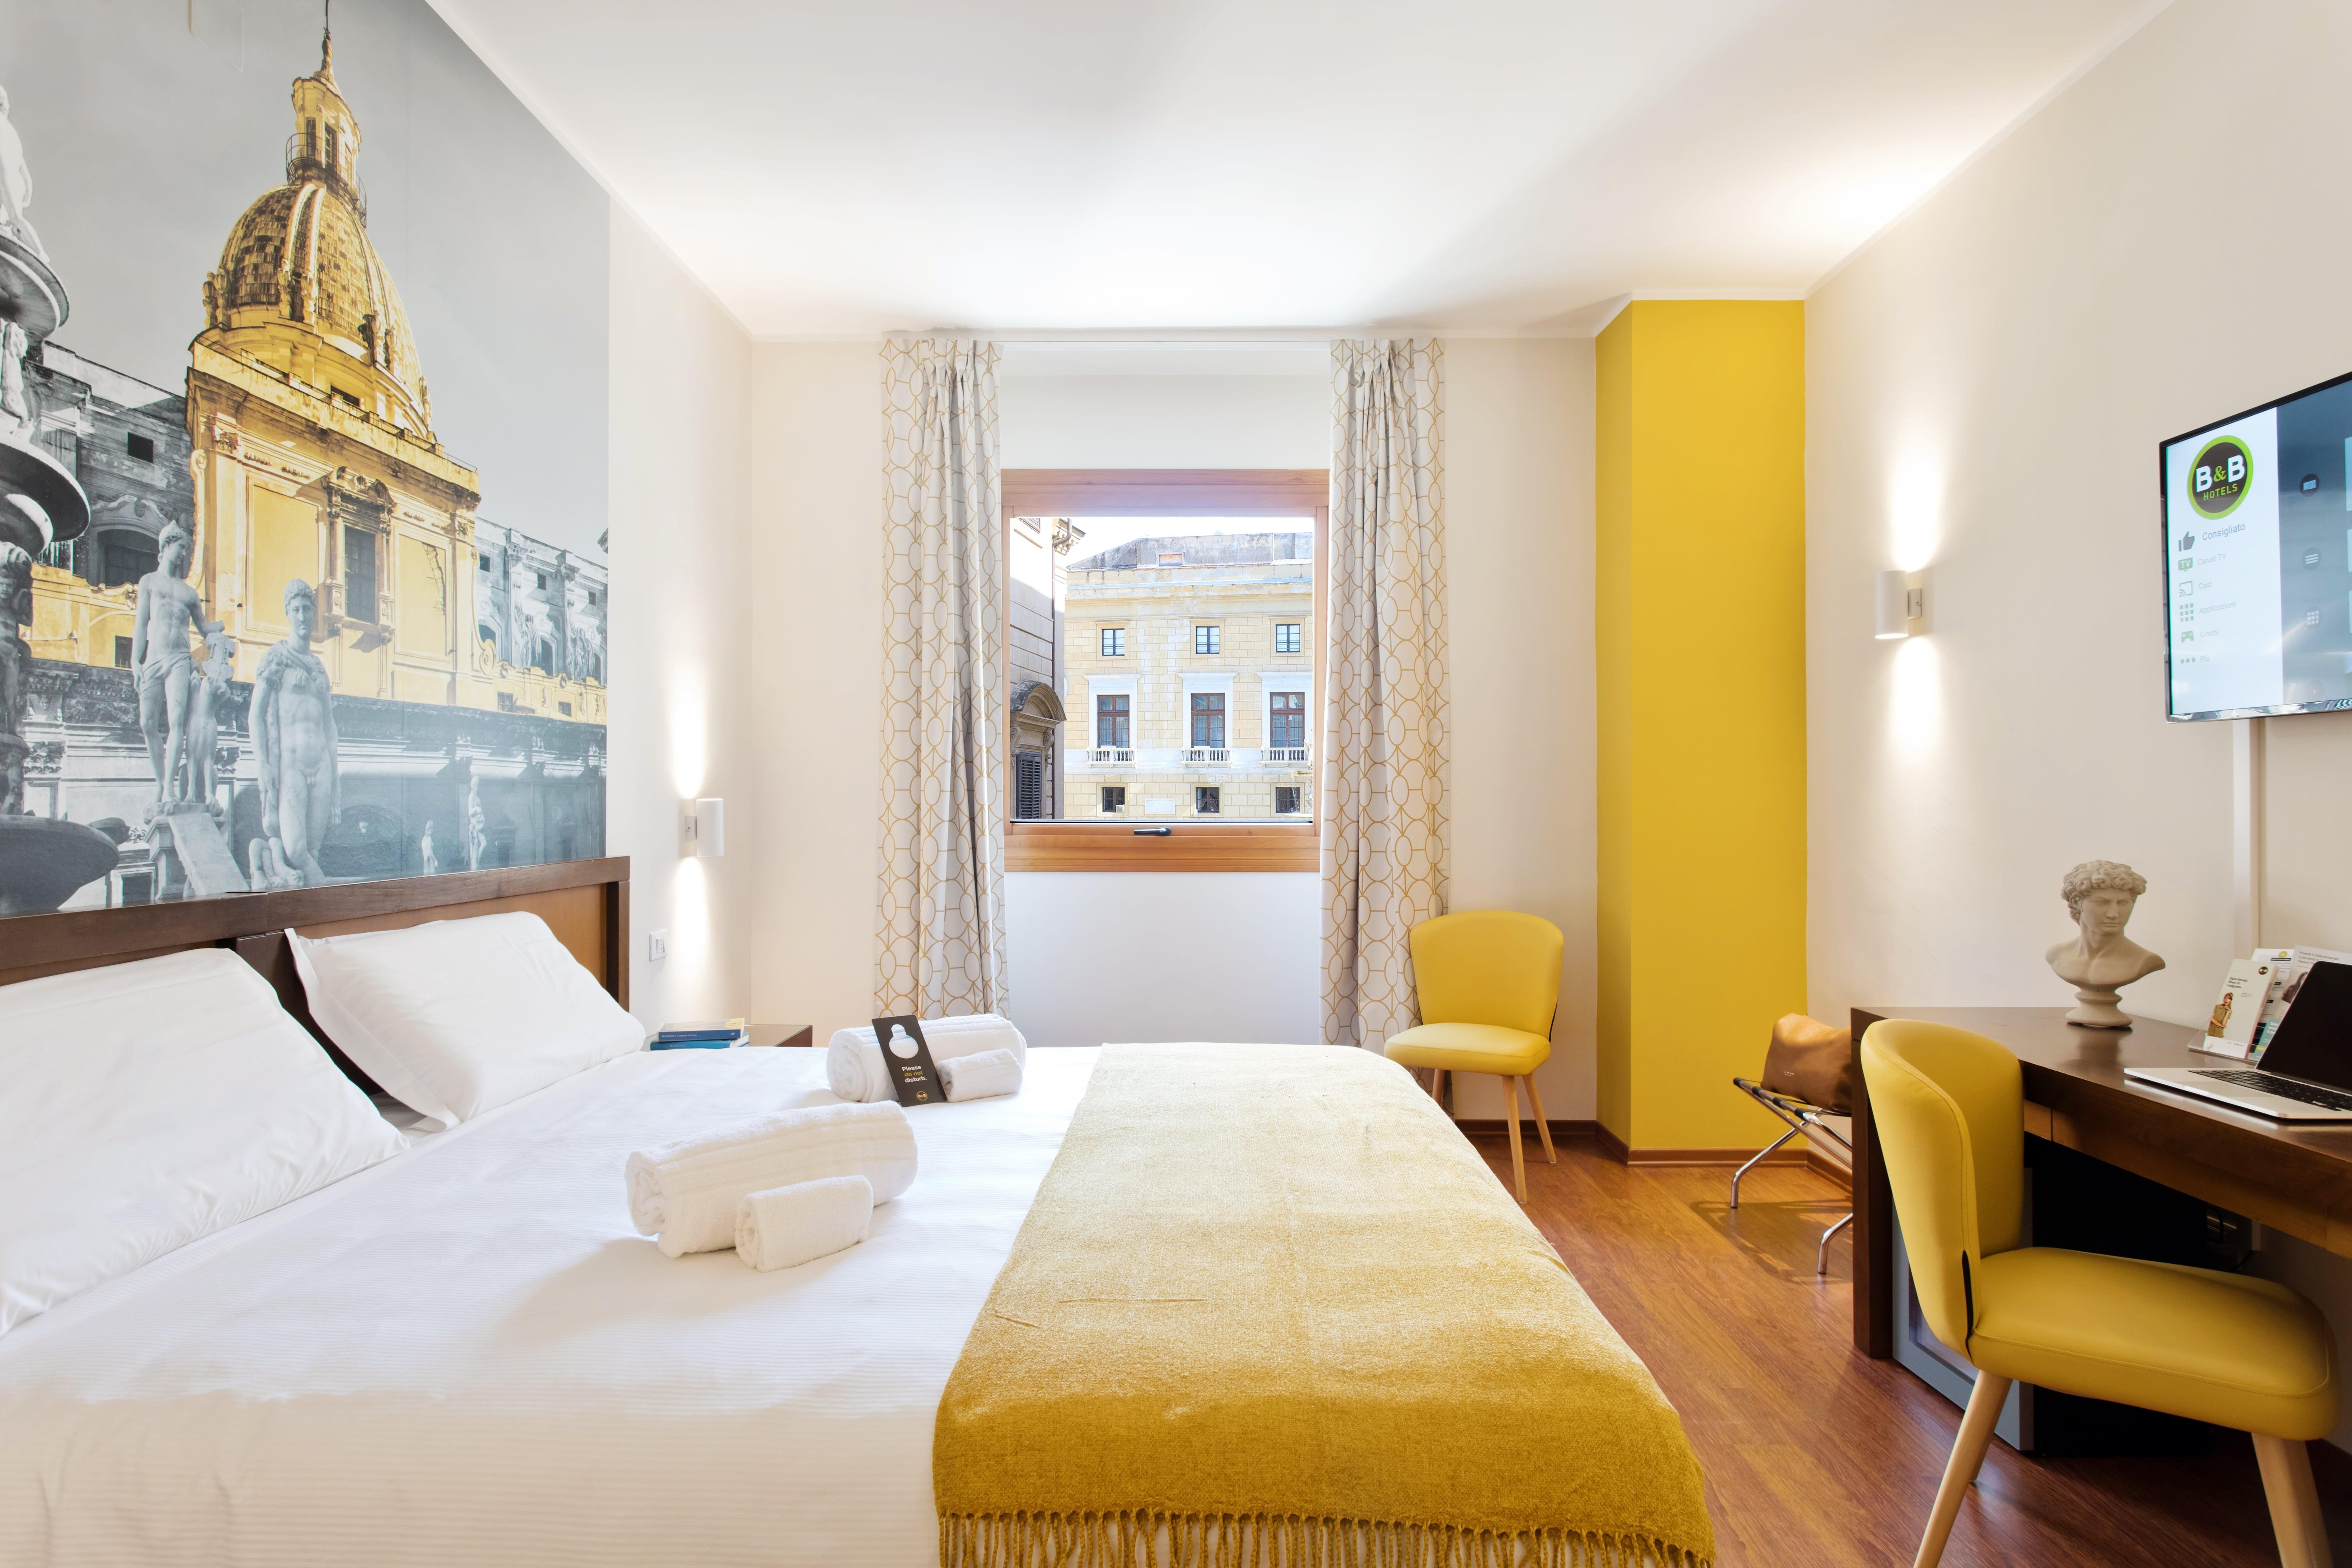 B&b Corso Sempione Milano b&b hotels italia spa | linkedin